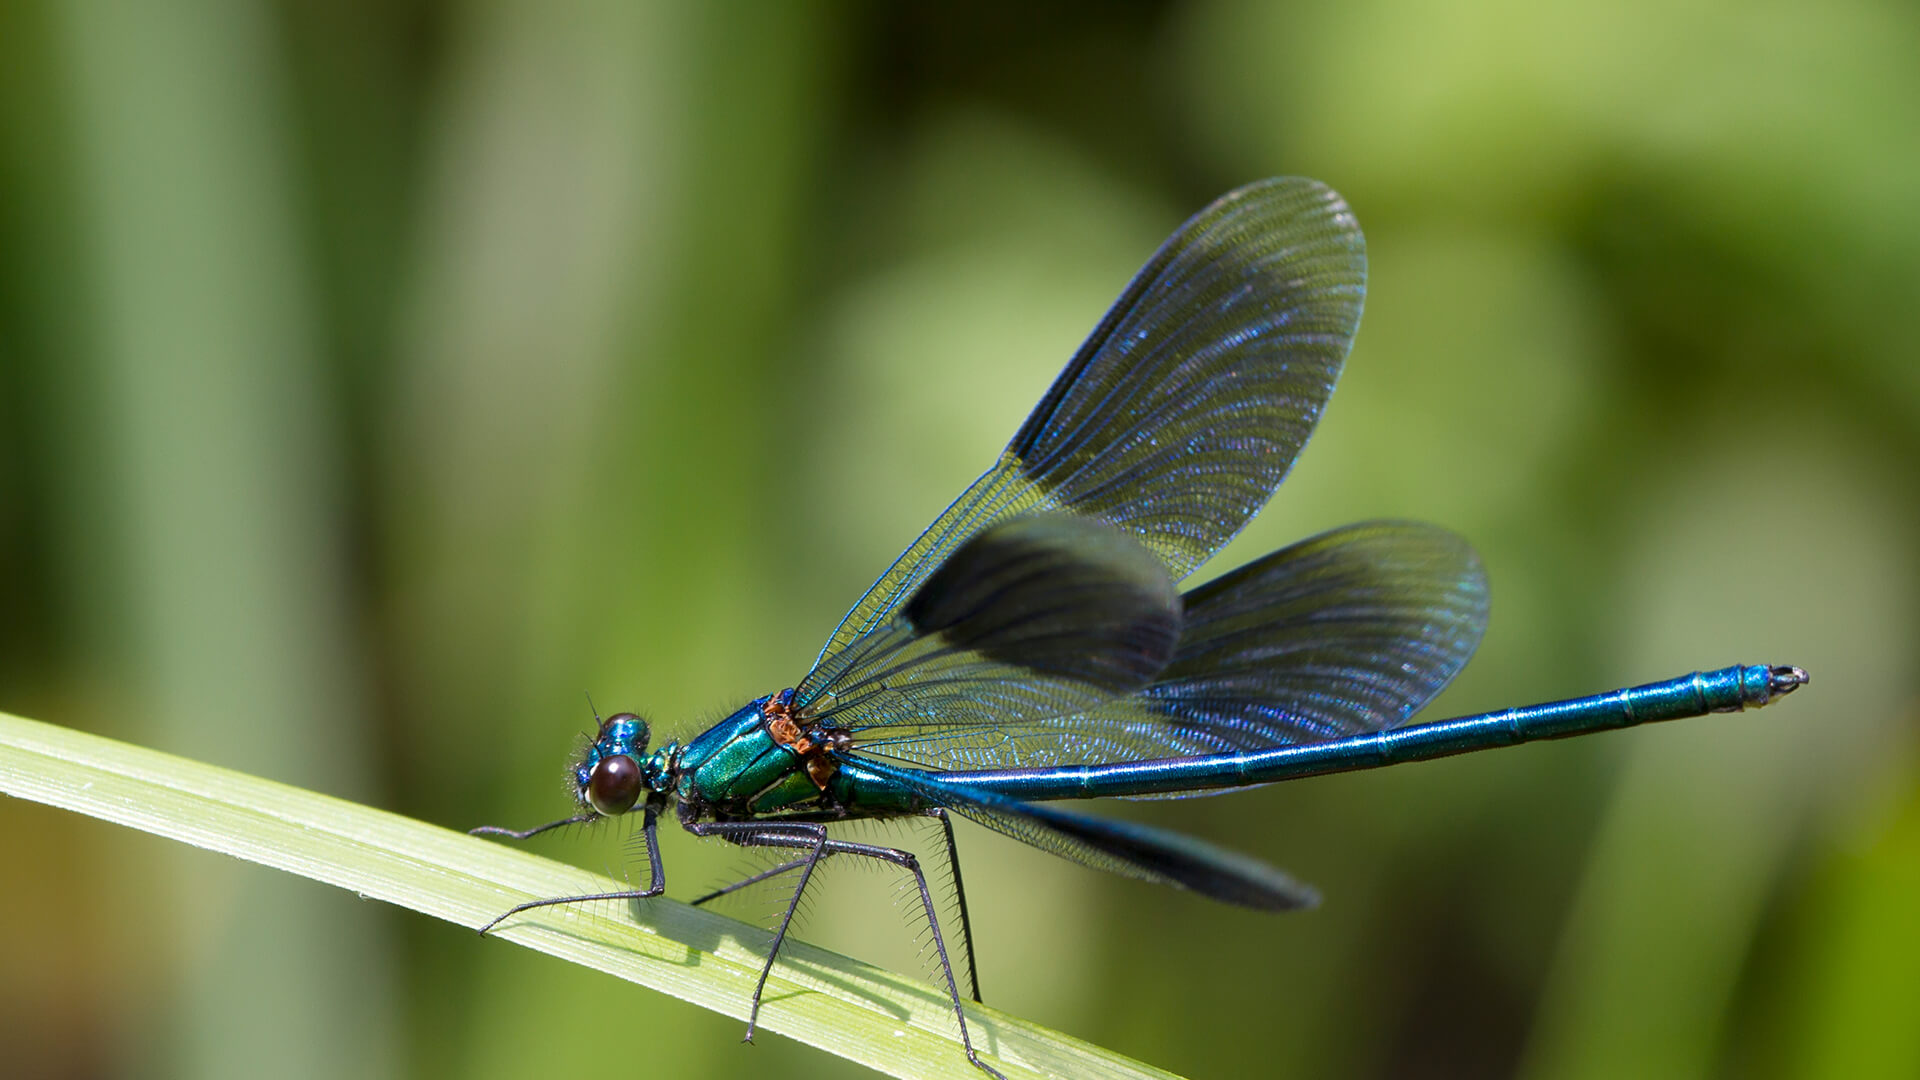 Dragonfly And Damselfly San Diego Zoo Animals Plants